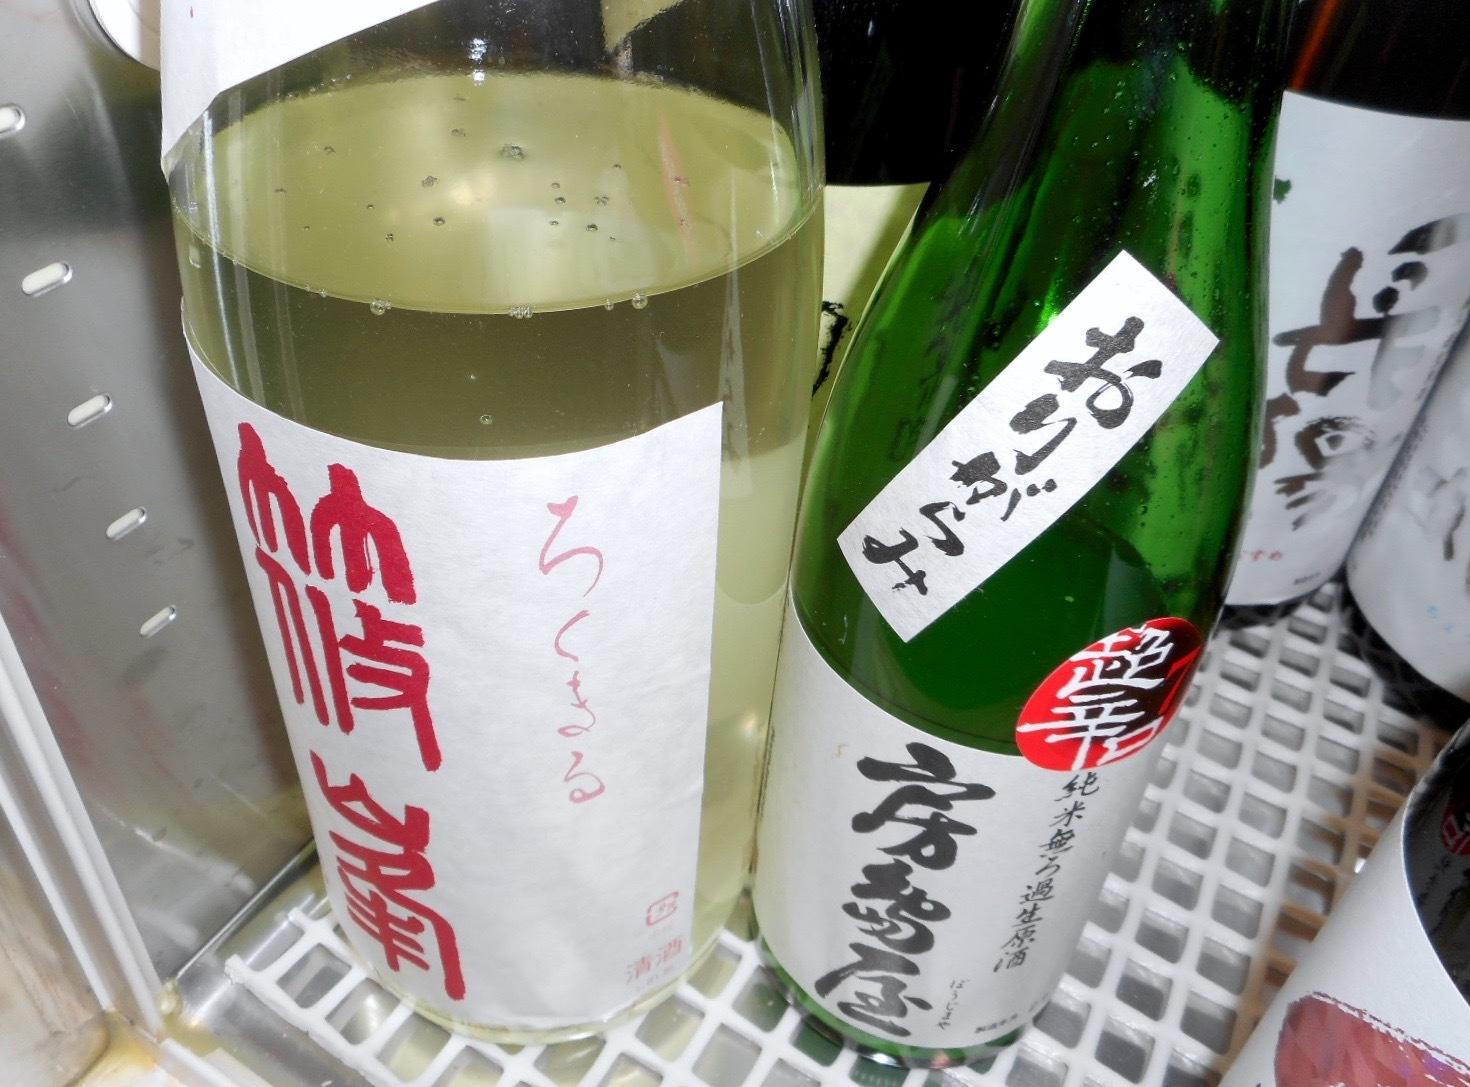 rokumaru_oyama_usunigori26by10.jpg